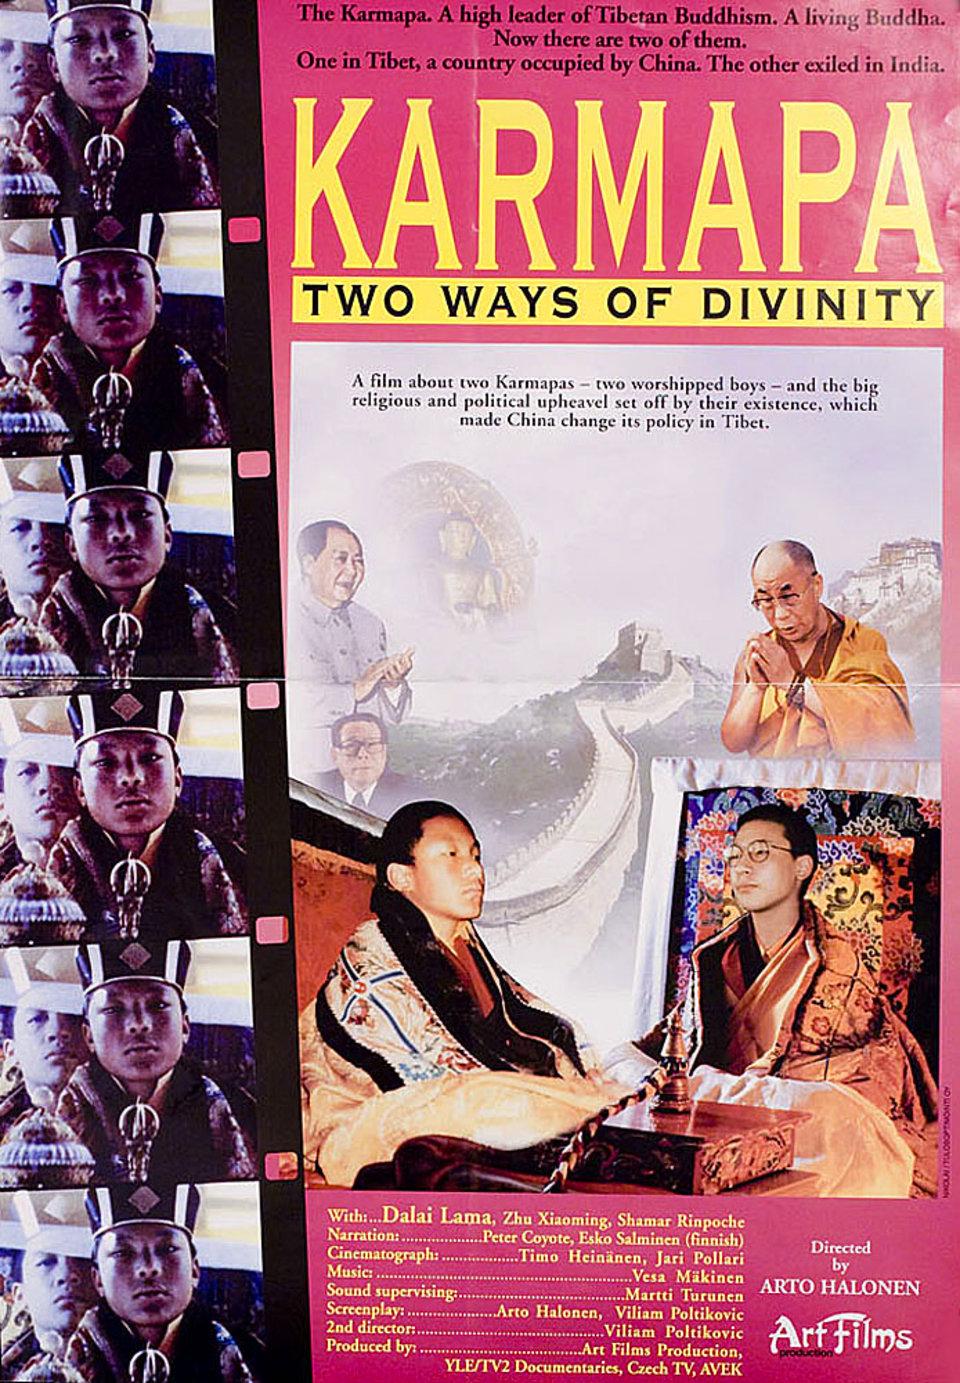 Karmapa - Two Ways of Divinity 1998 U.S. Mini Poster